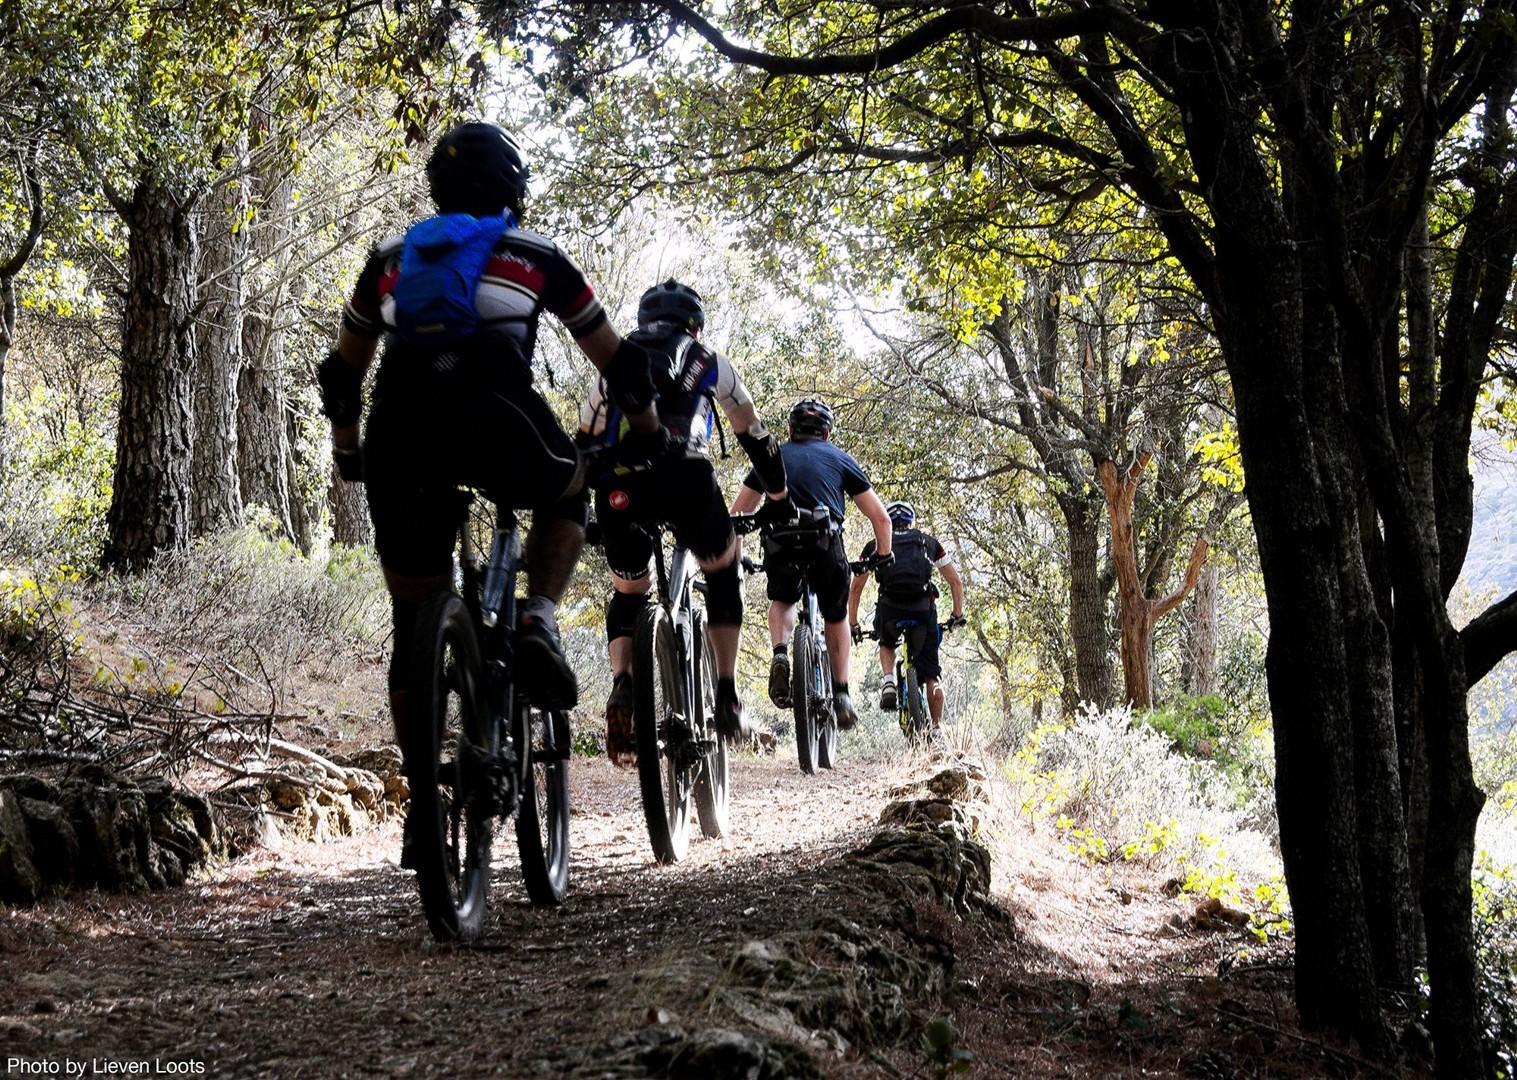 bike-from-north-to-south-sardinia-mtb-in-italy.jpg - Sardinia - Sardinia Traverse - Guided Mountain Bike Holiday - Mountain Biking